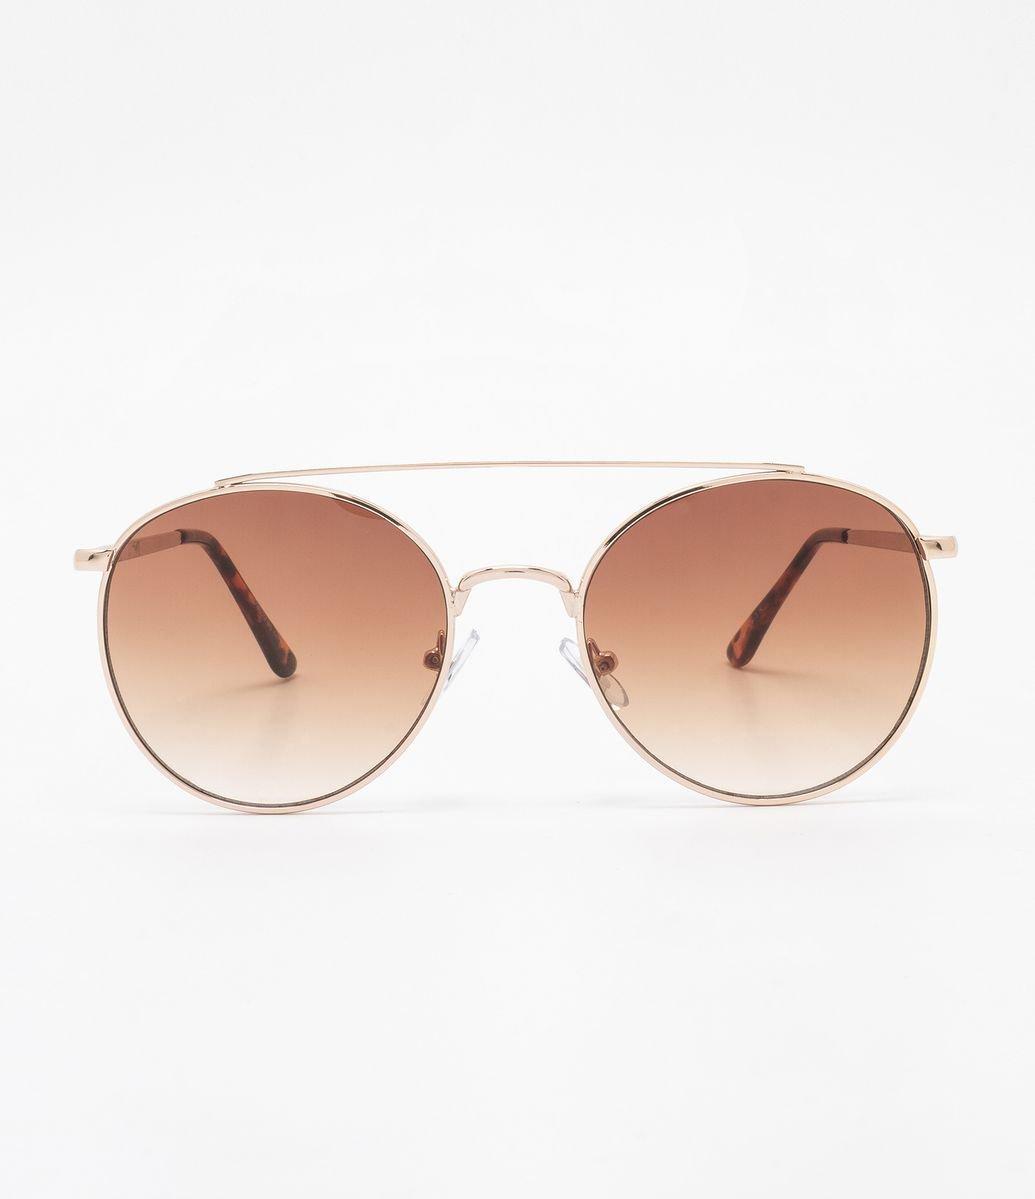 fa68e18a4f2b4 Óculos de Sol Feminino Redondo - Renner